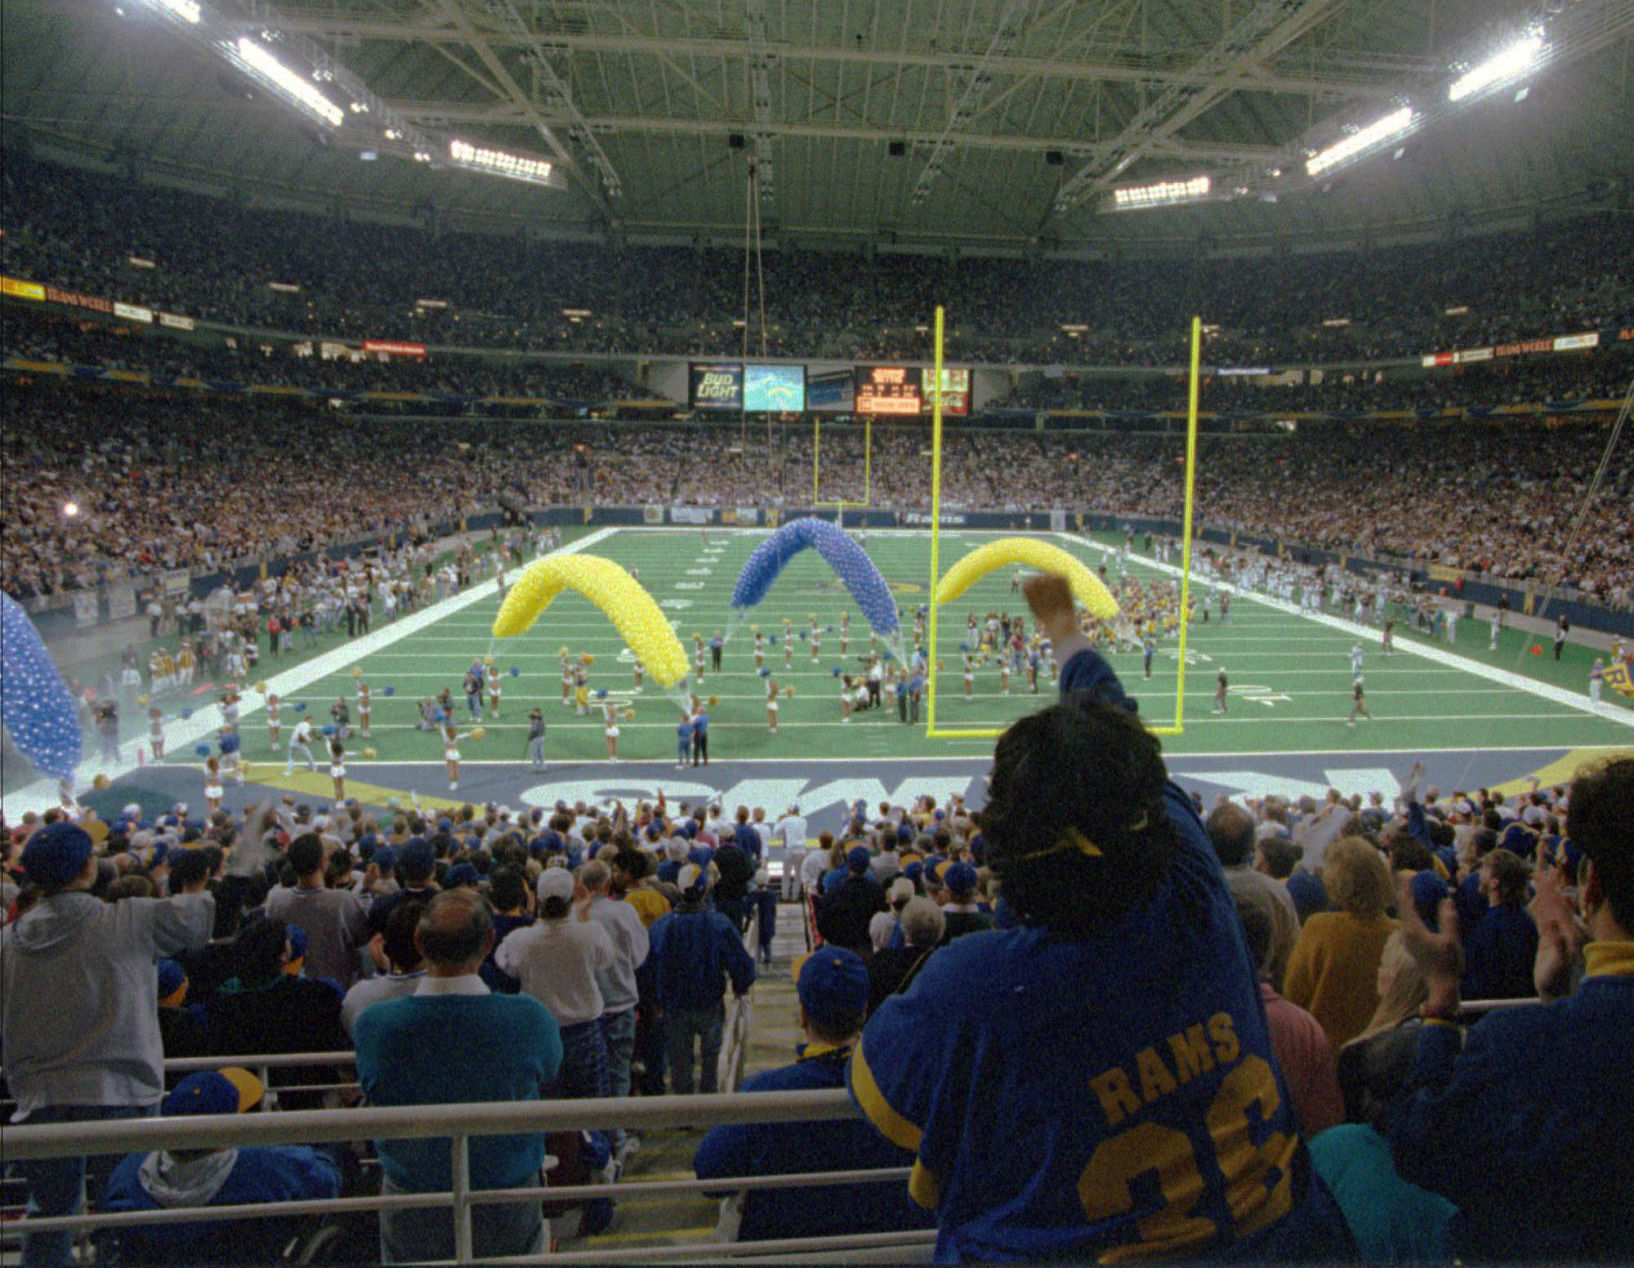 OR ST LOUIS RAMS NFL FOOTBALL TALKING BOTTLE OPENER SUPER BOWL XXXIV 2000 L.A